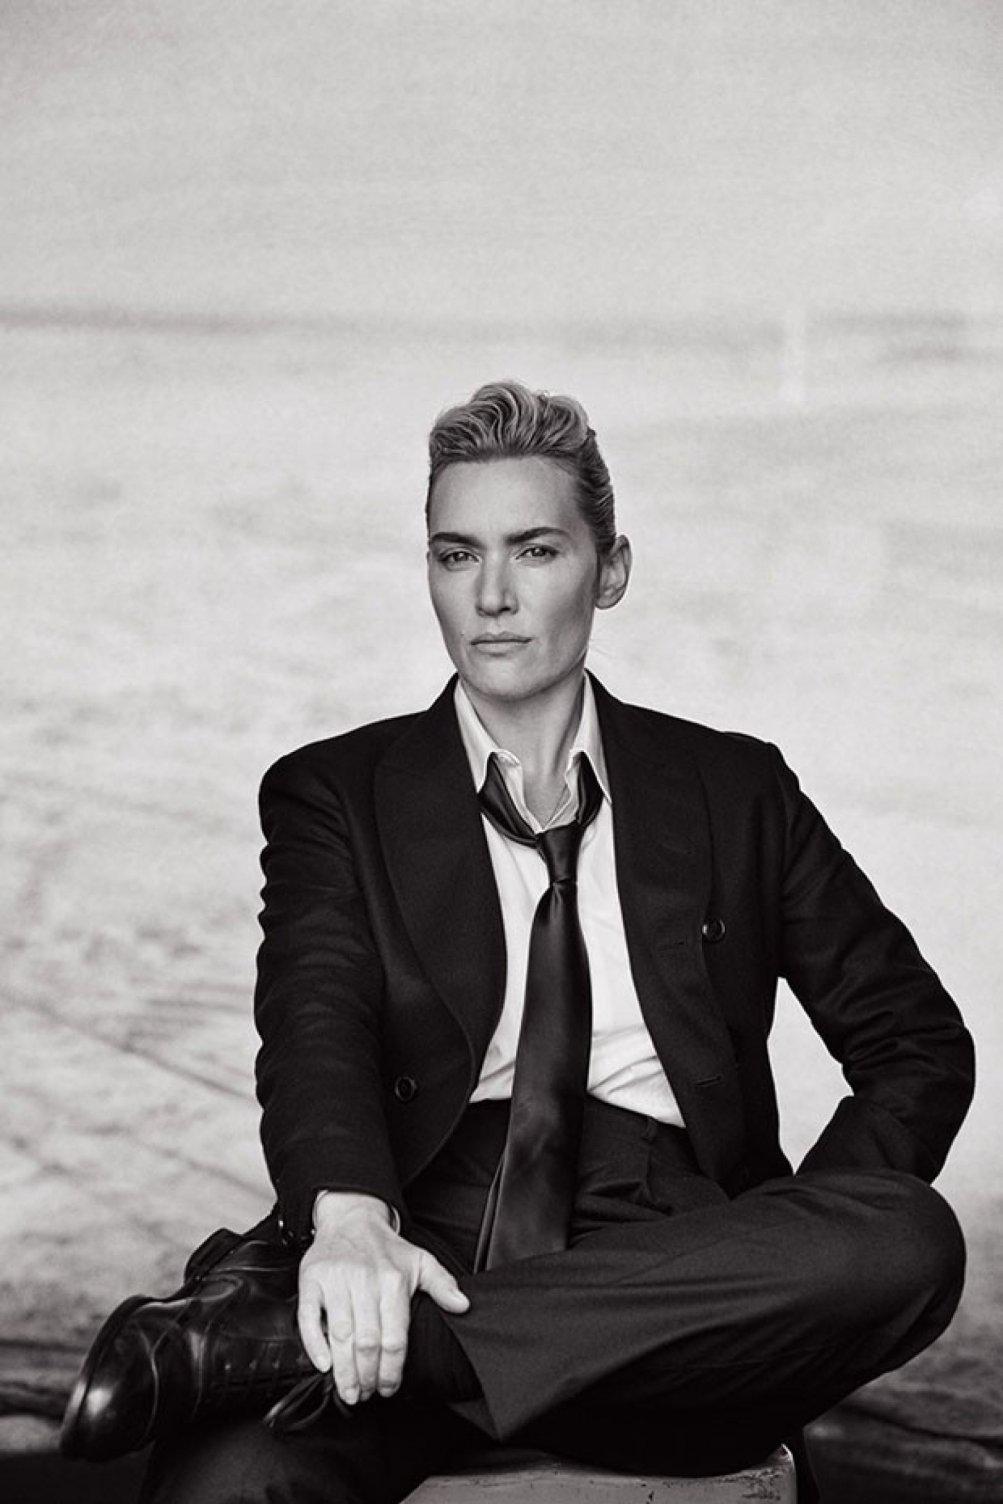 Kate Winslet fotografata vestita da uomo da Lindbergh per L'Uomo Vogue